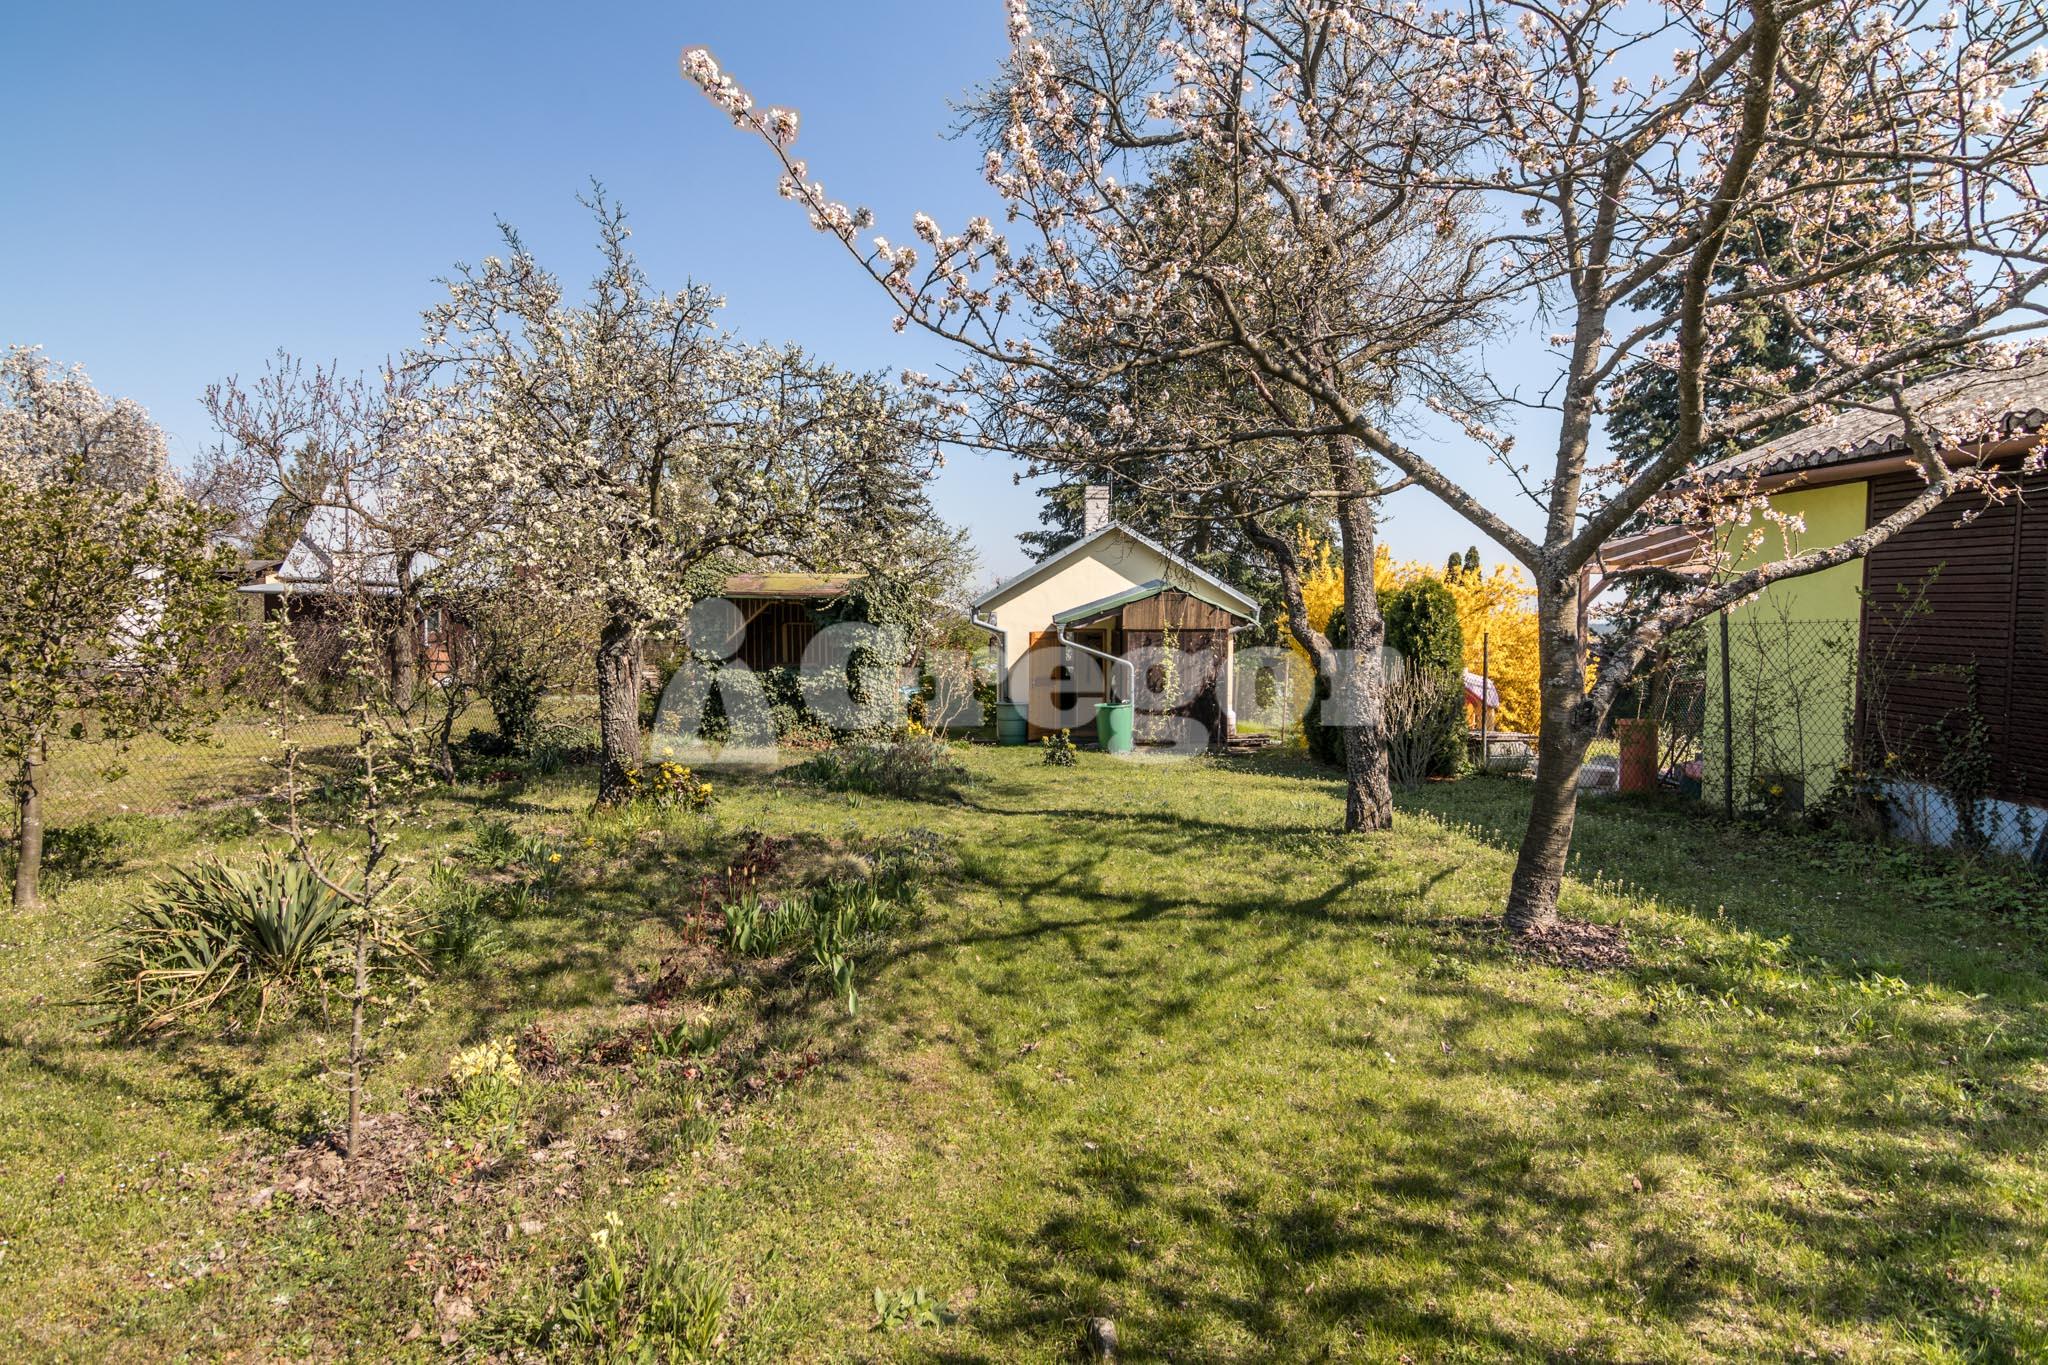 Zahrada na Jurance (14 of 23)